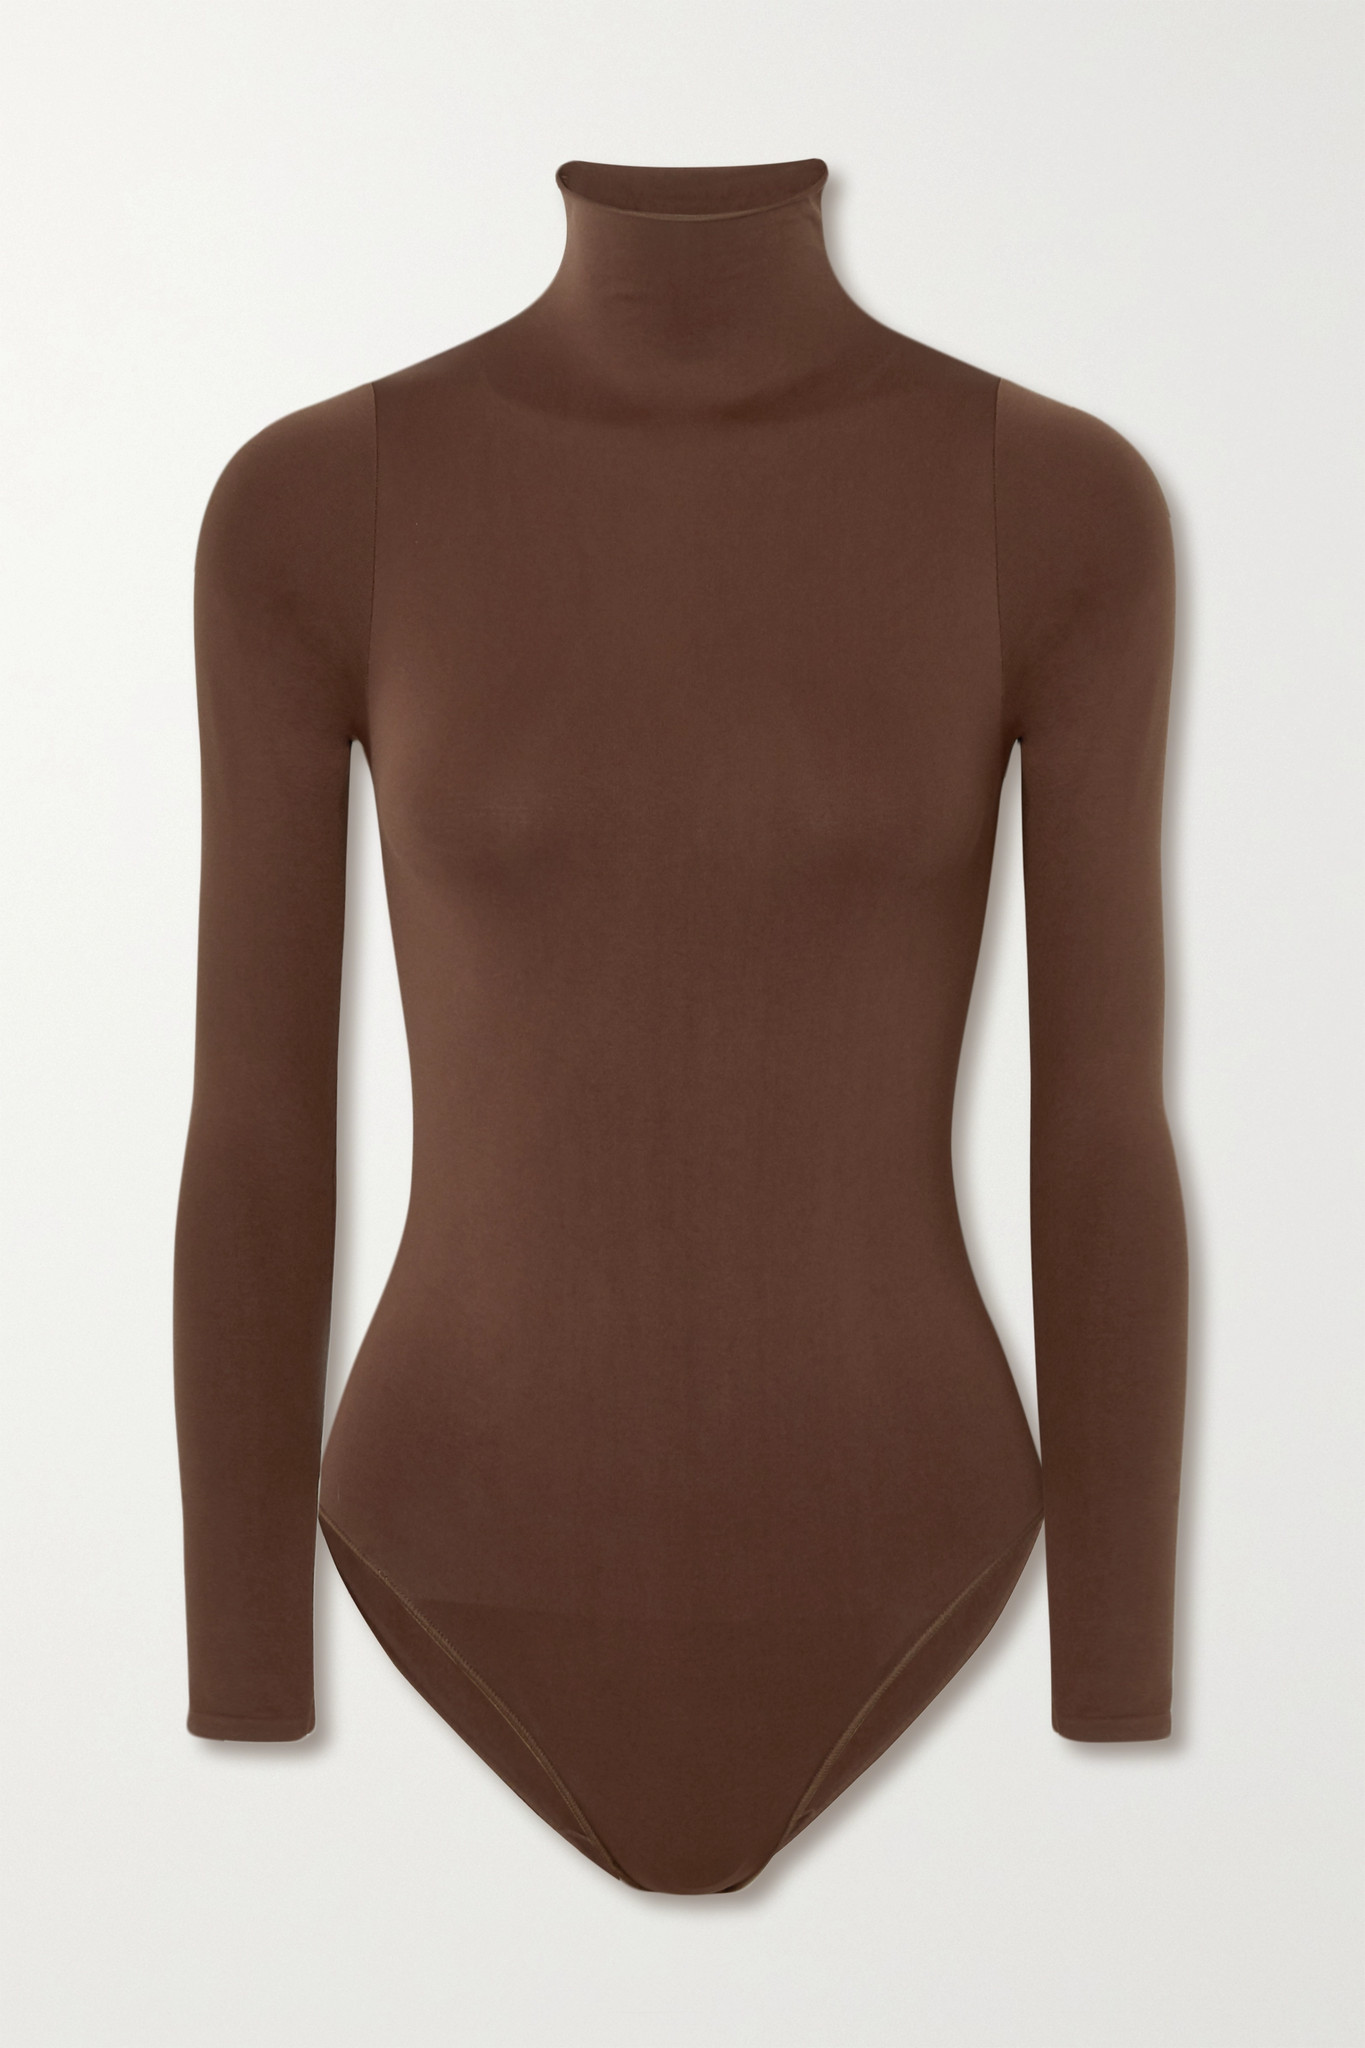 SKIMS - Essential Mock Neck Bodysuit - Onyx - Neutrals - L/XL